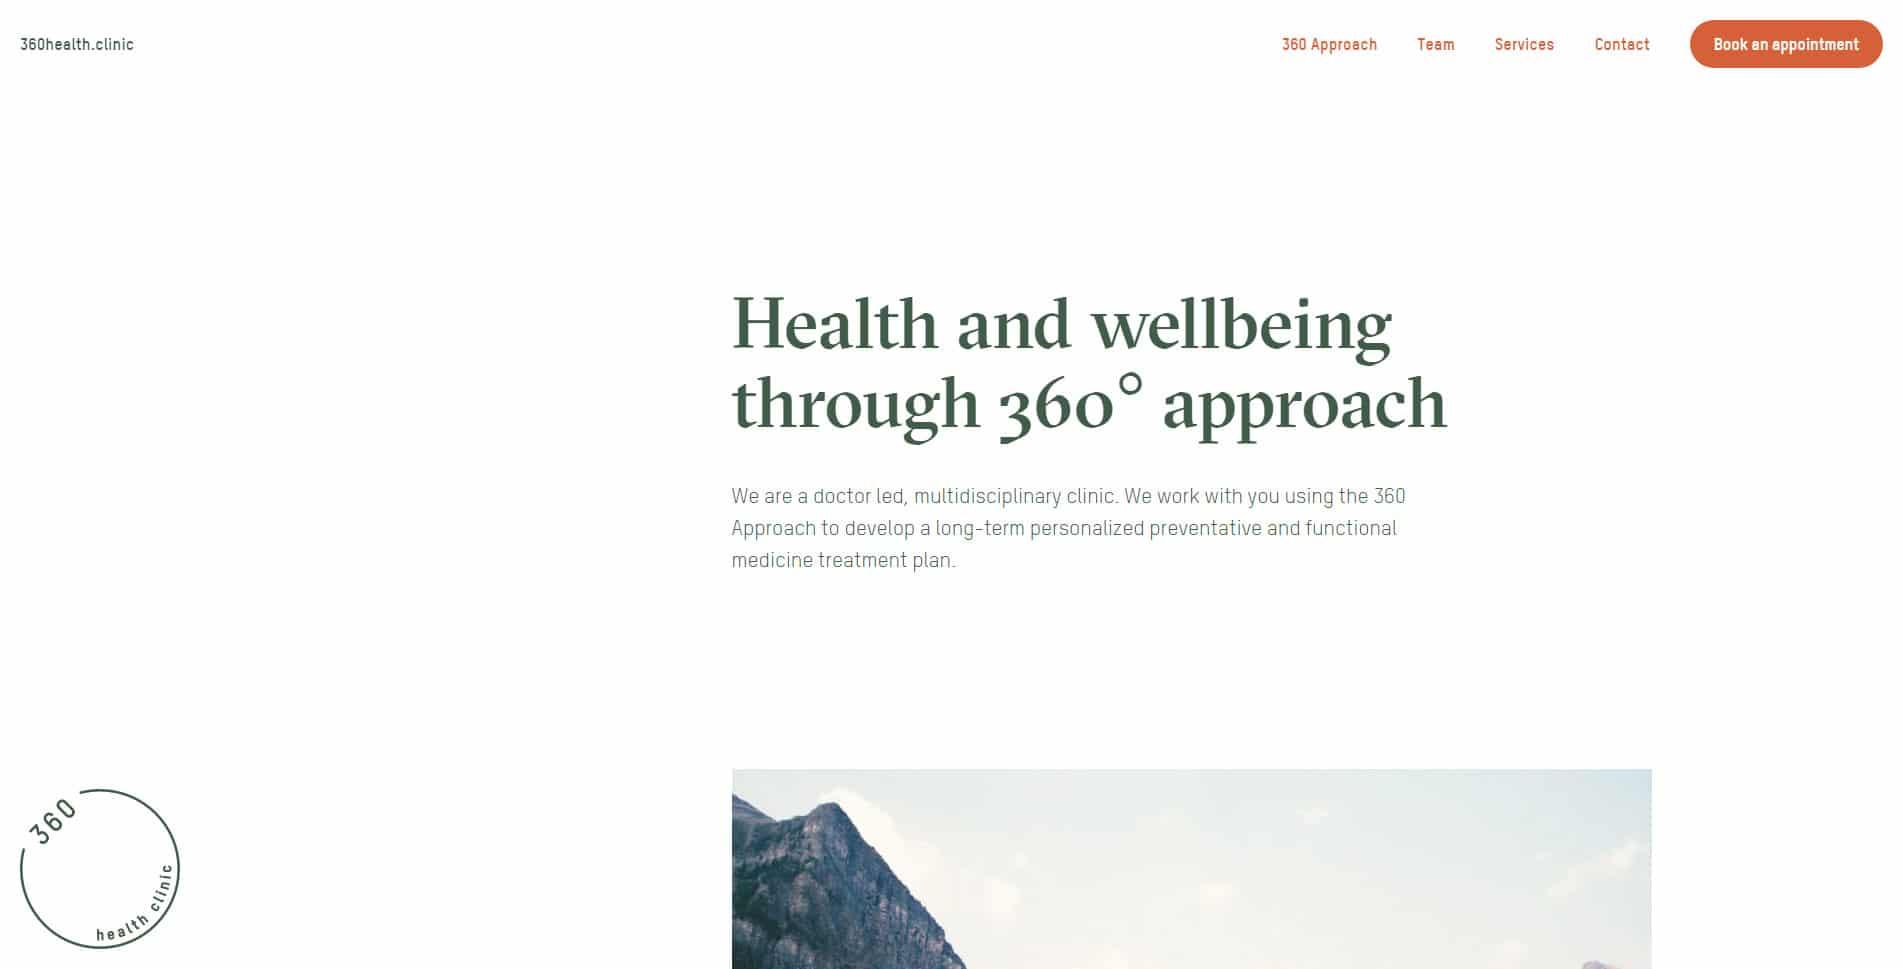 360 Health Clinic